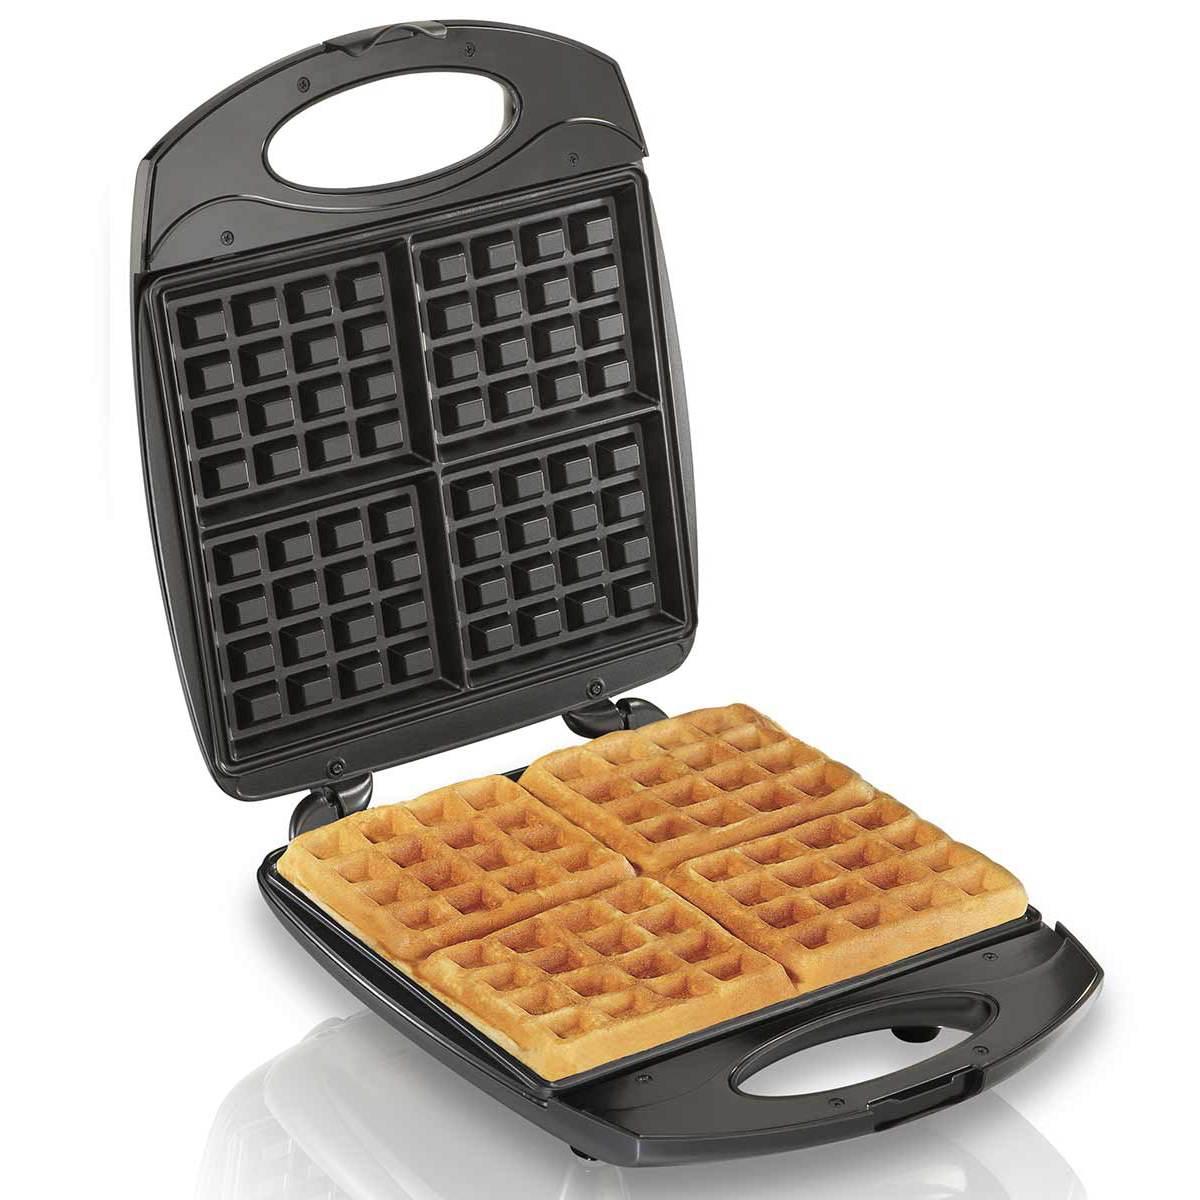 Belgian Style Waffle Maker (26020)